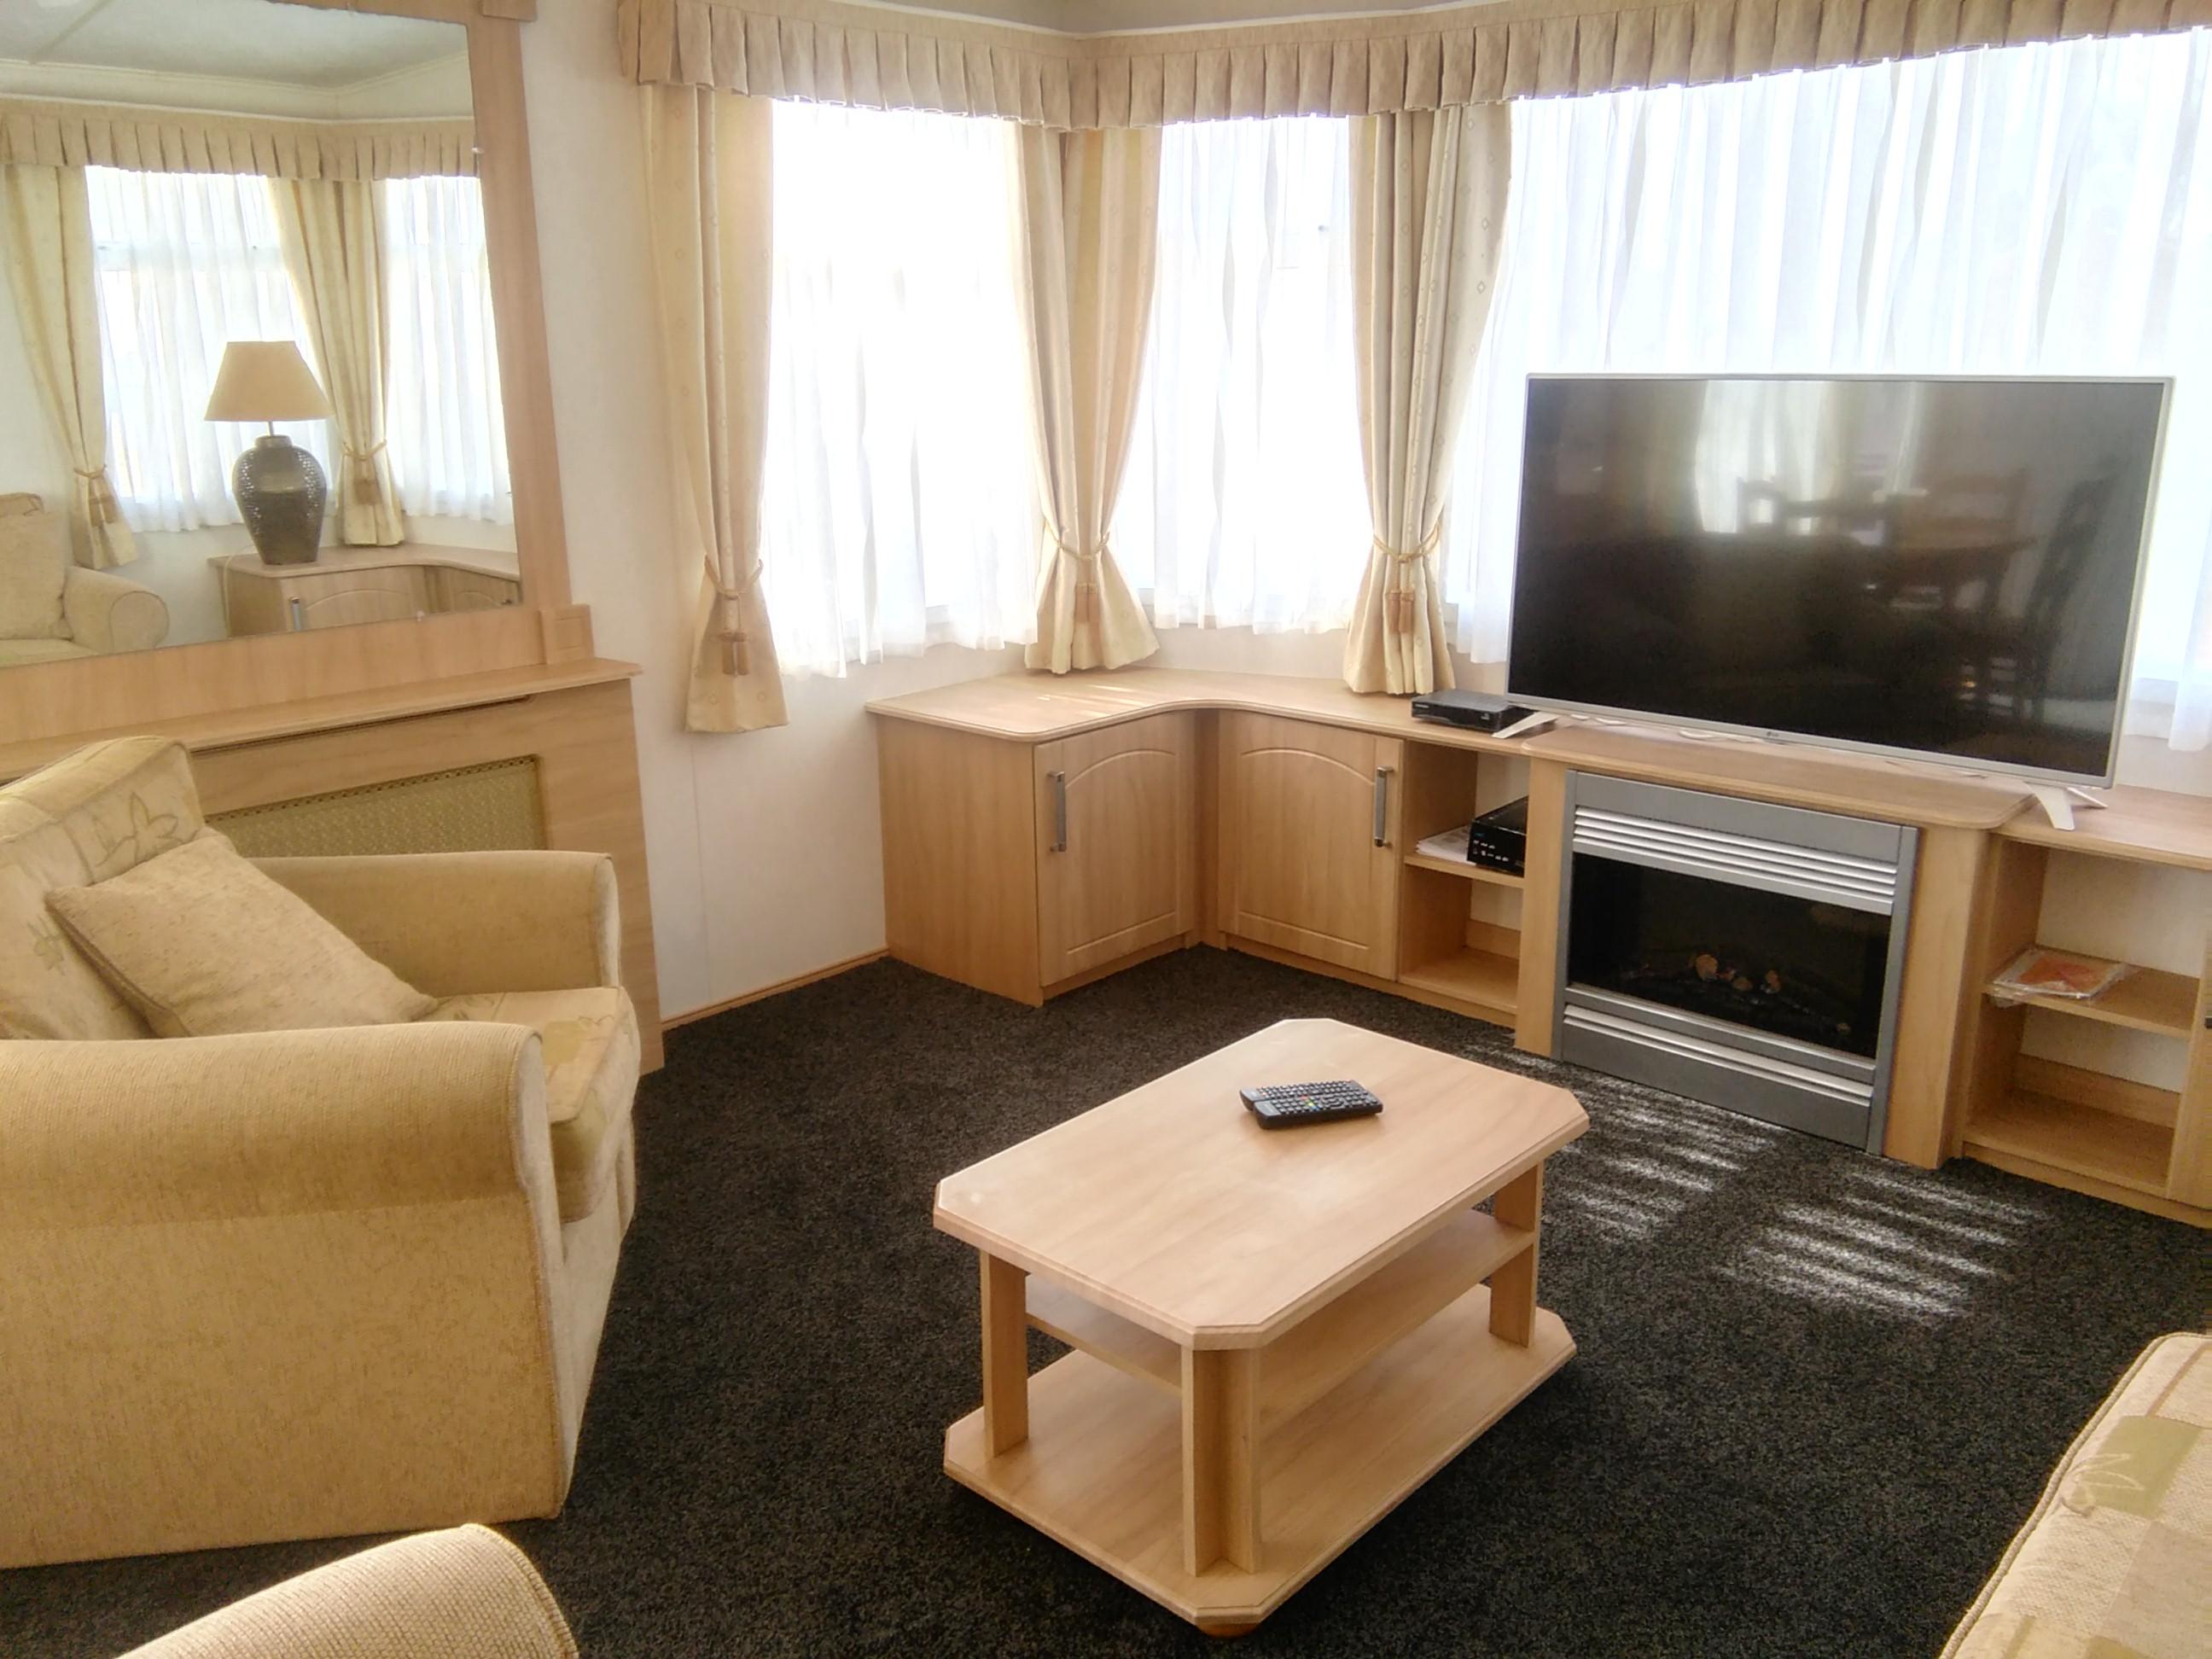 Innovative  Home For Sale In Benidorm Spain 22495  Benidorm Caravan Sales